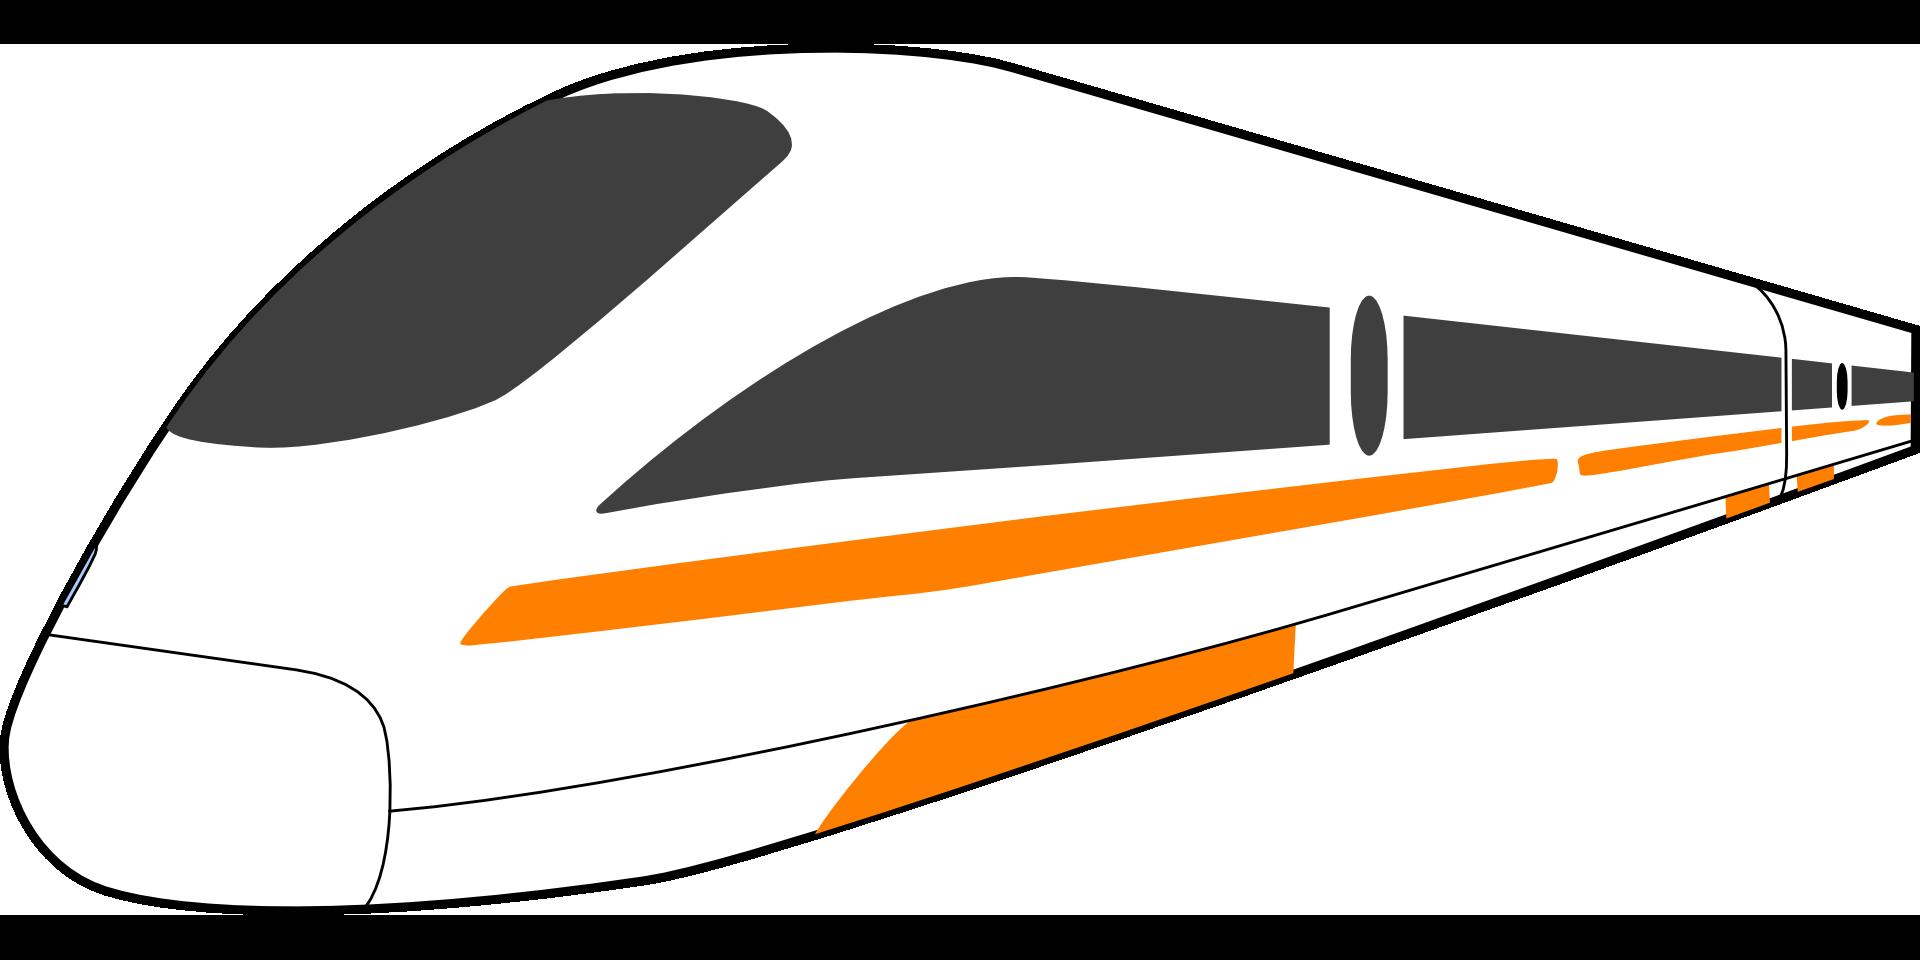 Track clipart railway indian track. Train rail transport intercity